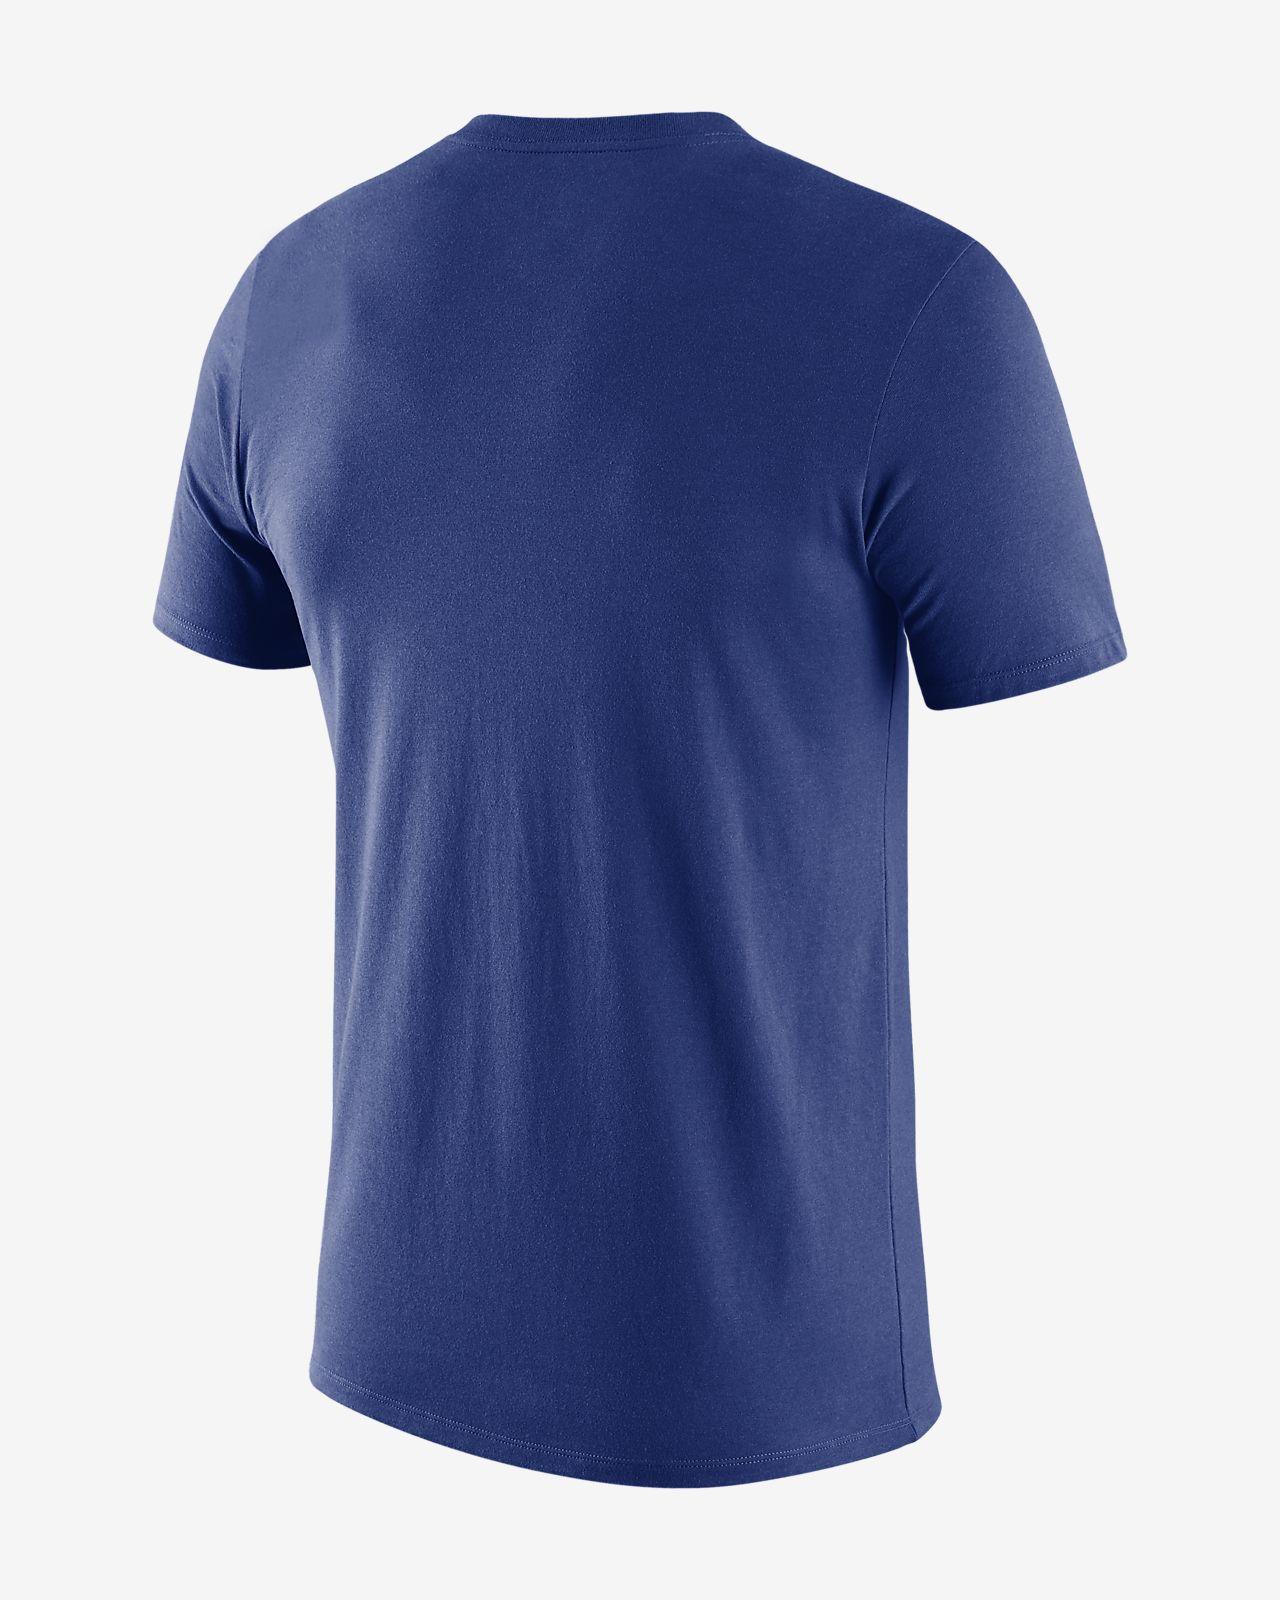 Tee shirt NBA New York Knicks Nike Dri FIT pour Homme